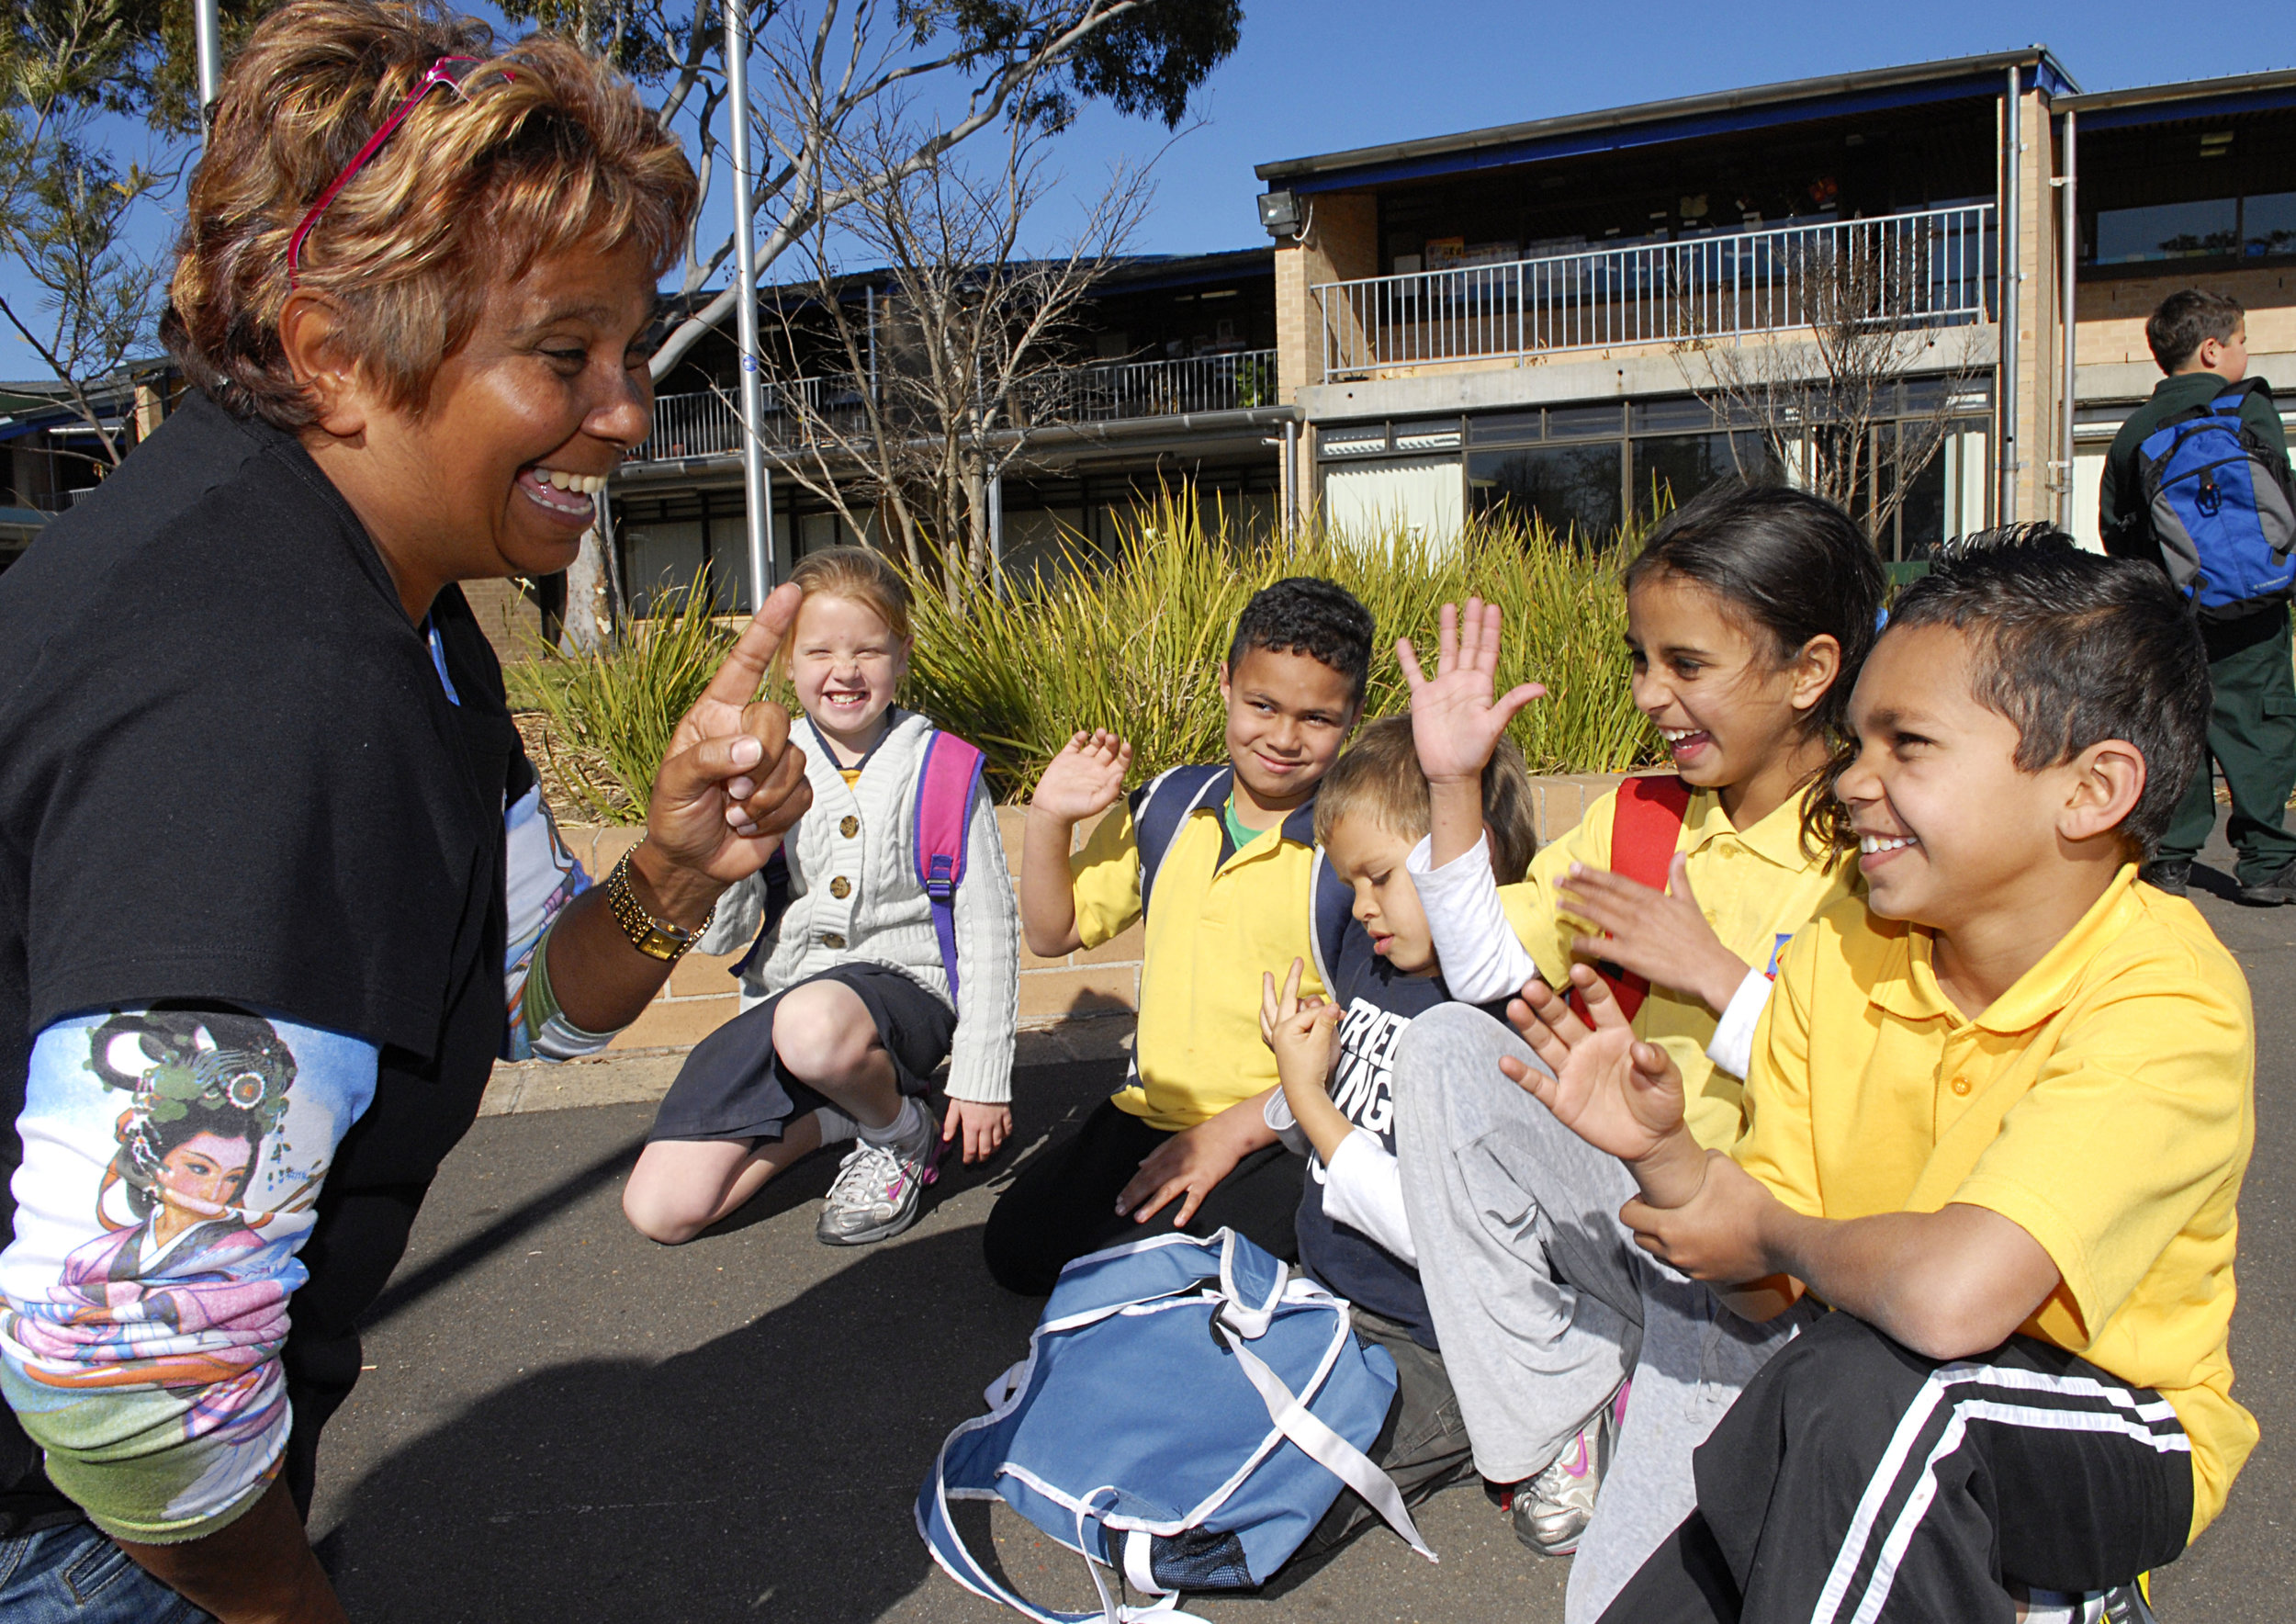 Aboriginal children going to school with Aunty Joy. Health, happy going to school.